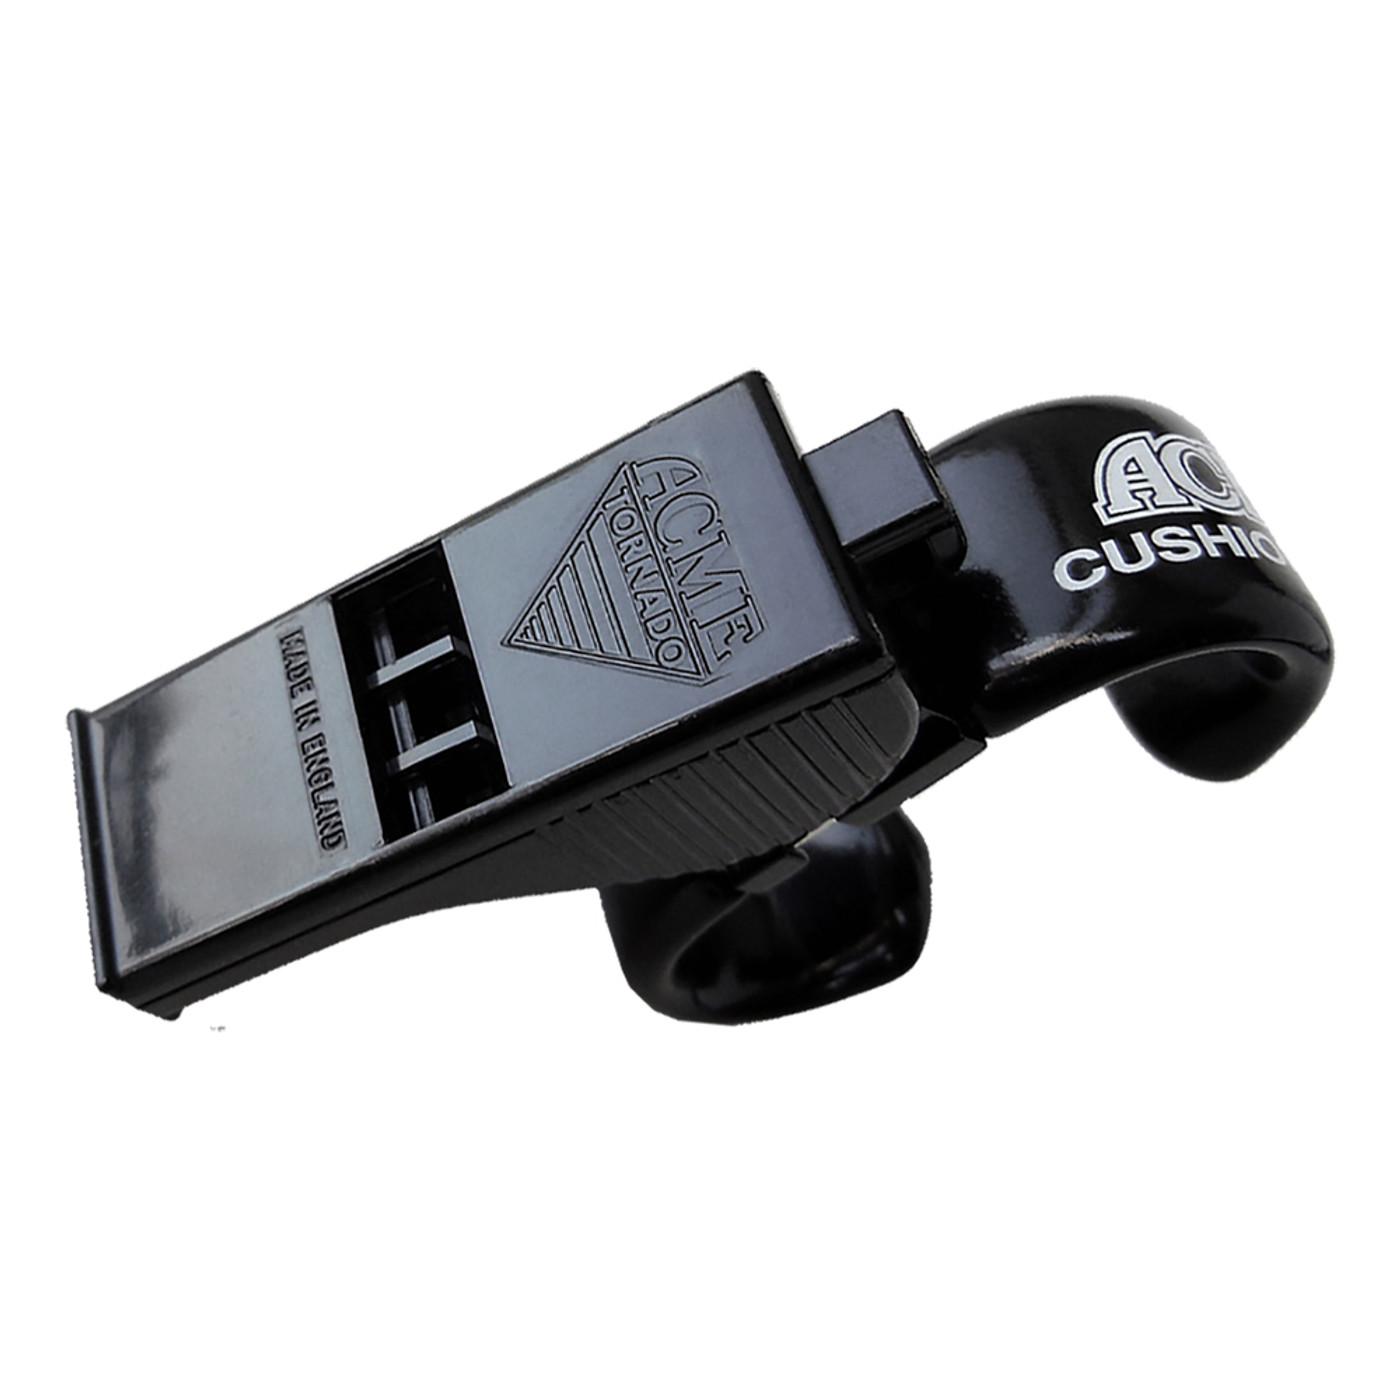 623F Acme Fingergrip Tornado Whistle